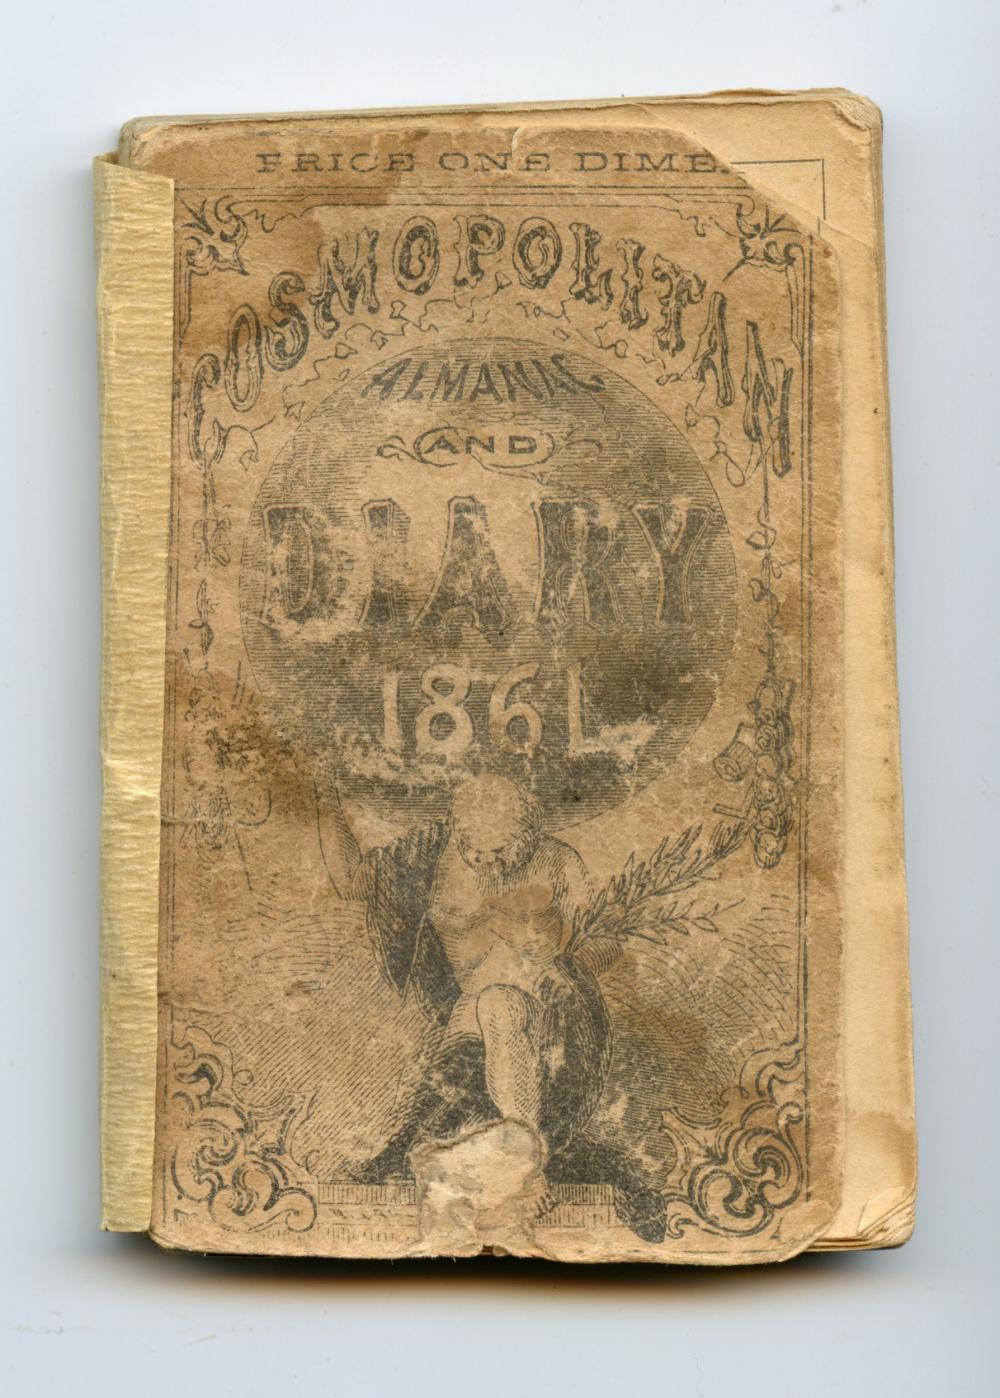 Civil War 1863 Almanac